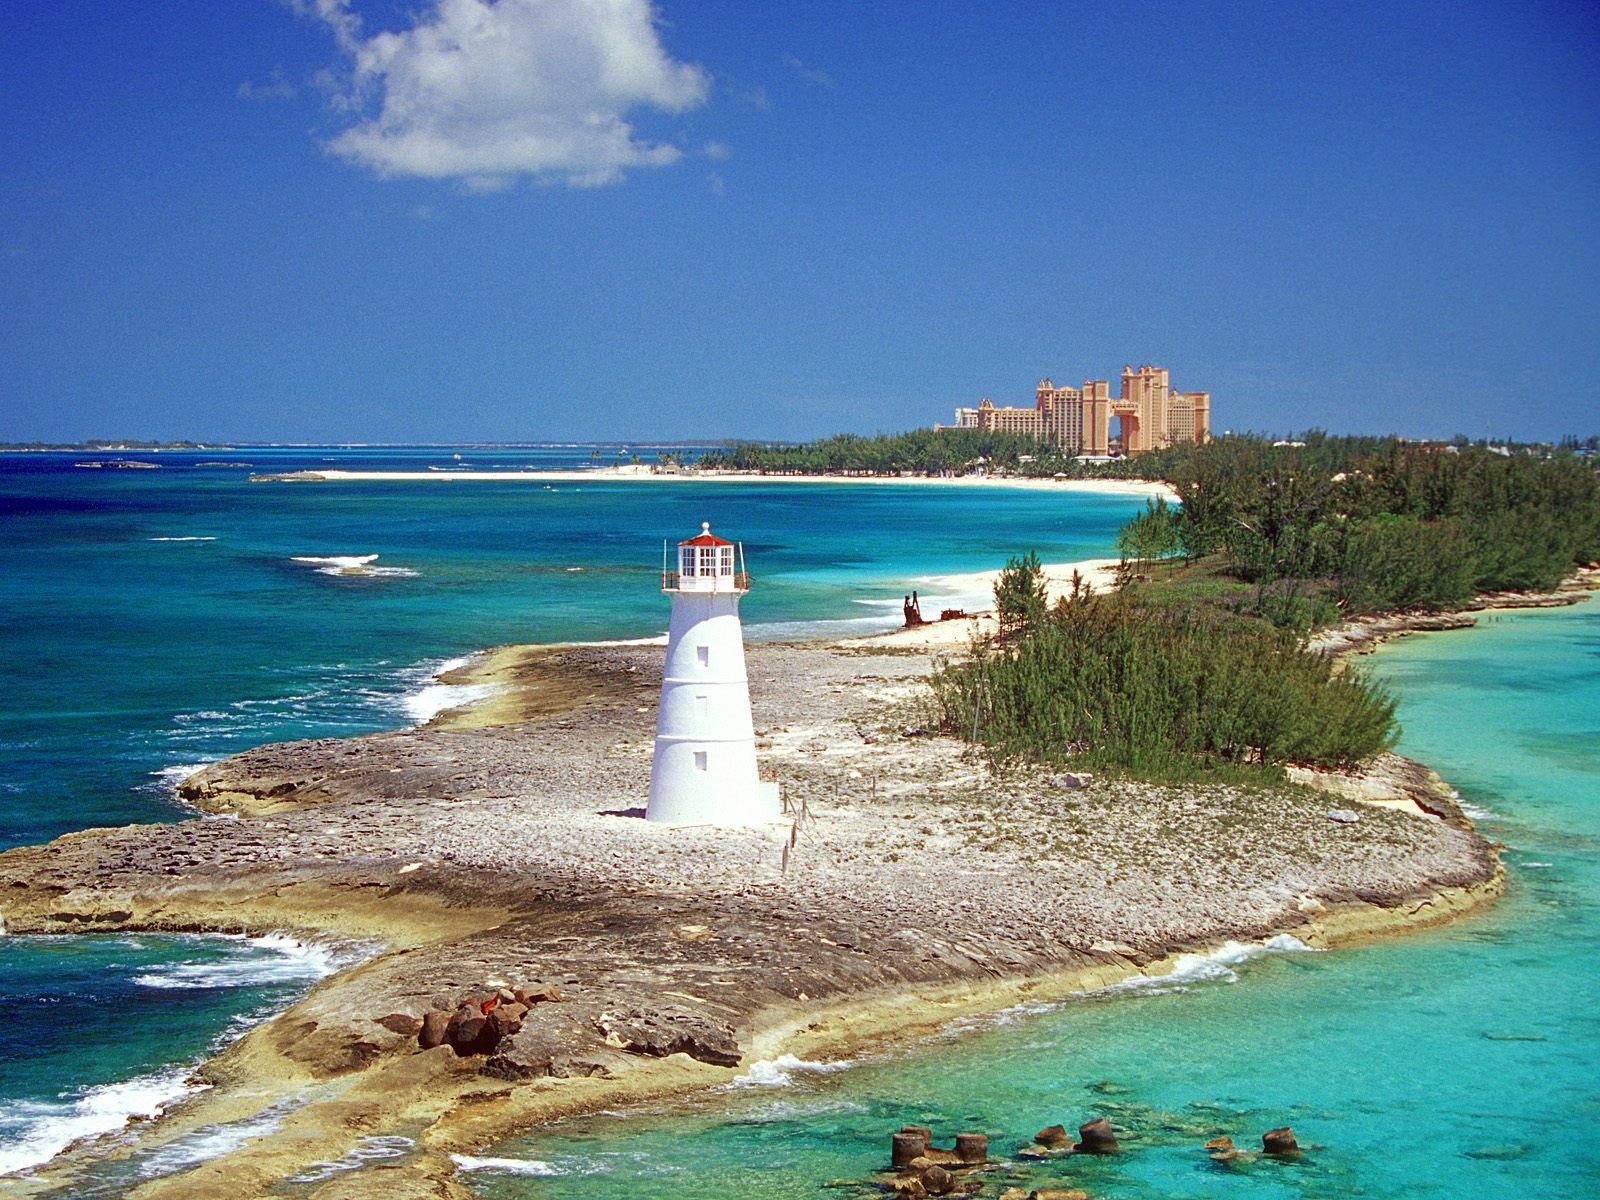 Wallpapers Beach Desktop Backgrounds Images Photos paradise island 1600x1200